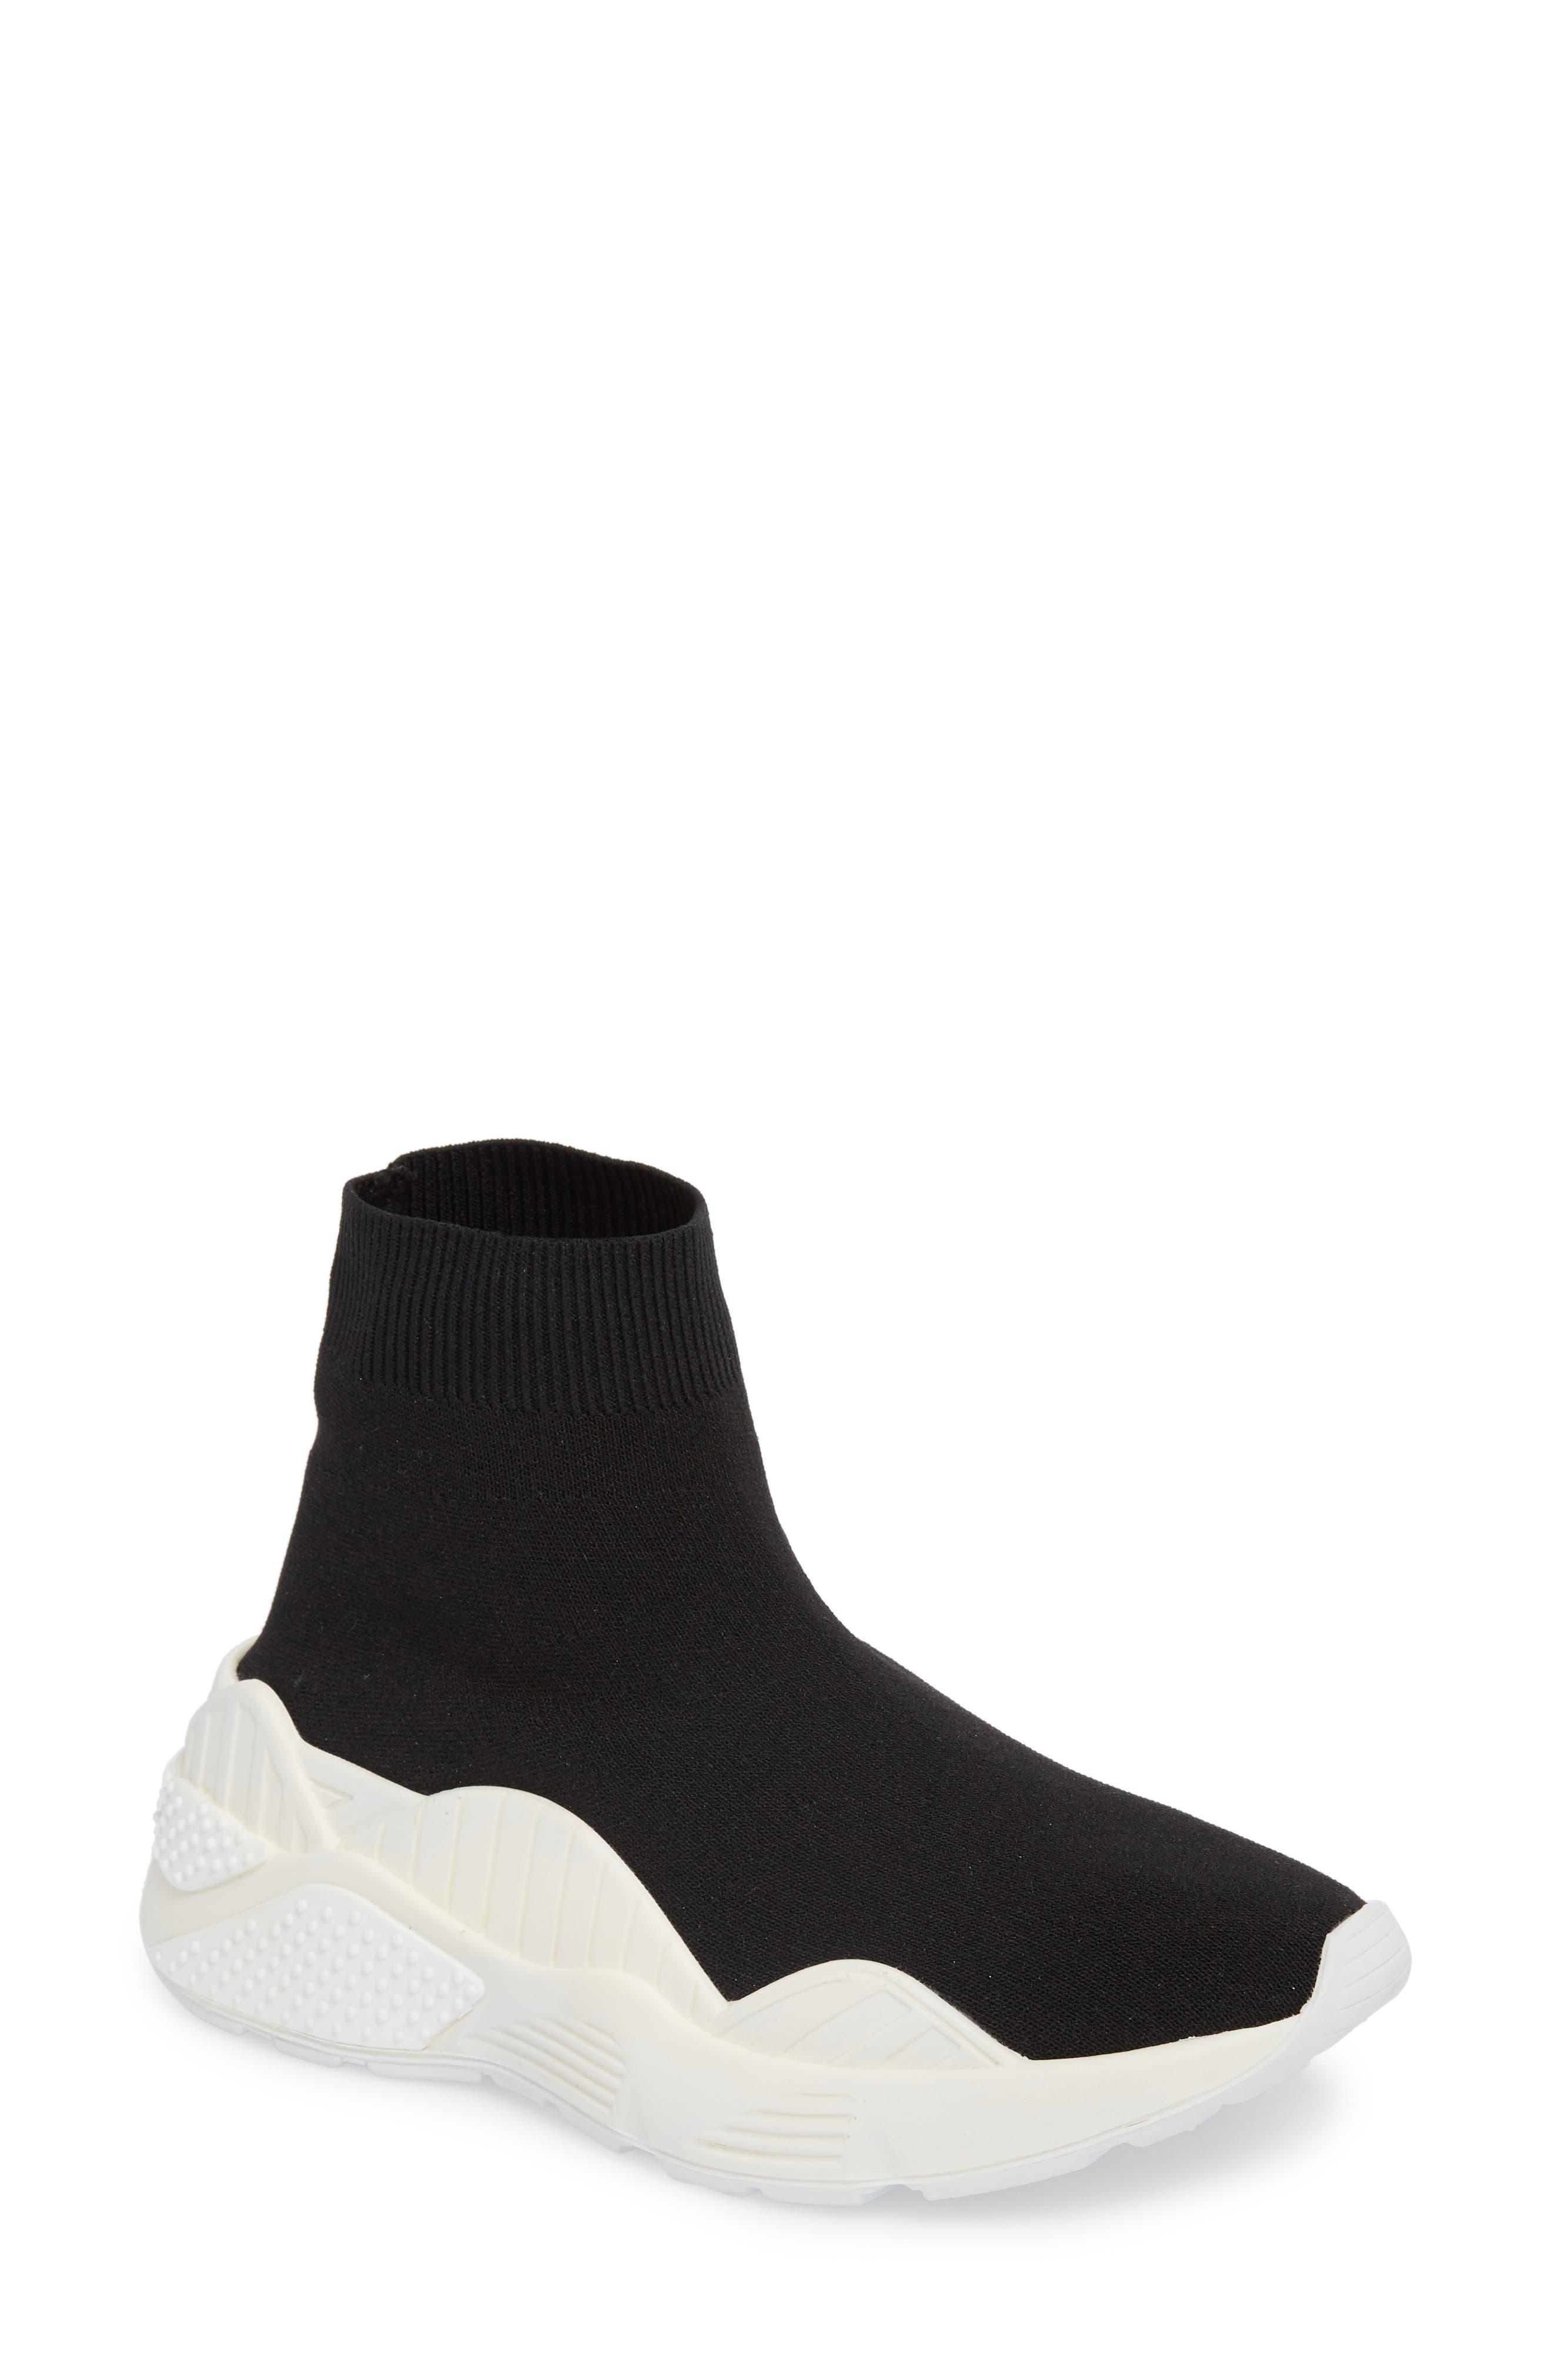 Lunix Sock Sneaker,                         Main,                         color, 014